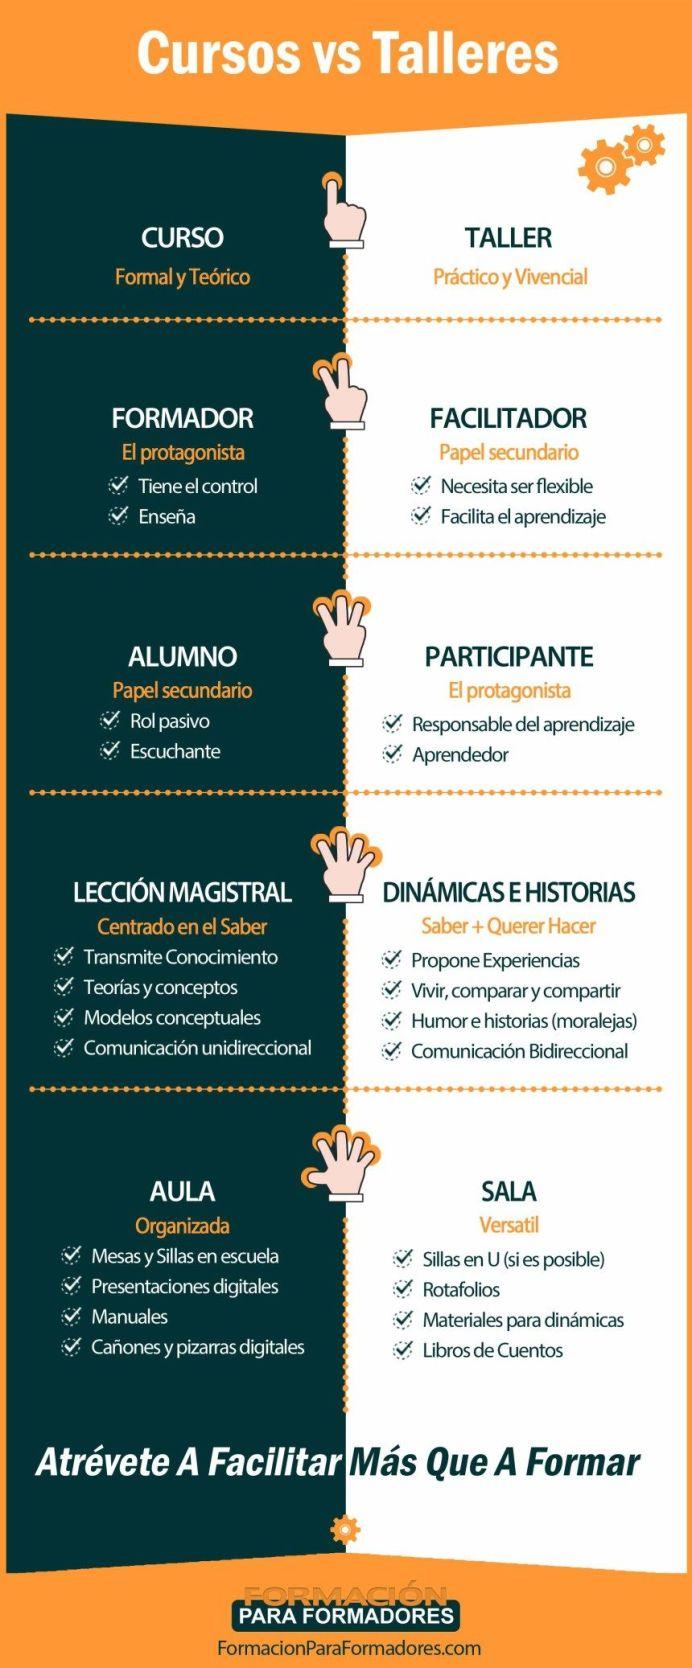 CursosVsTalleres-Infografía-BlogGesvin